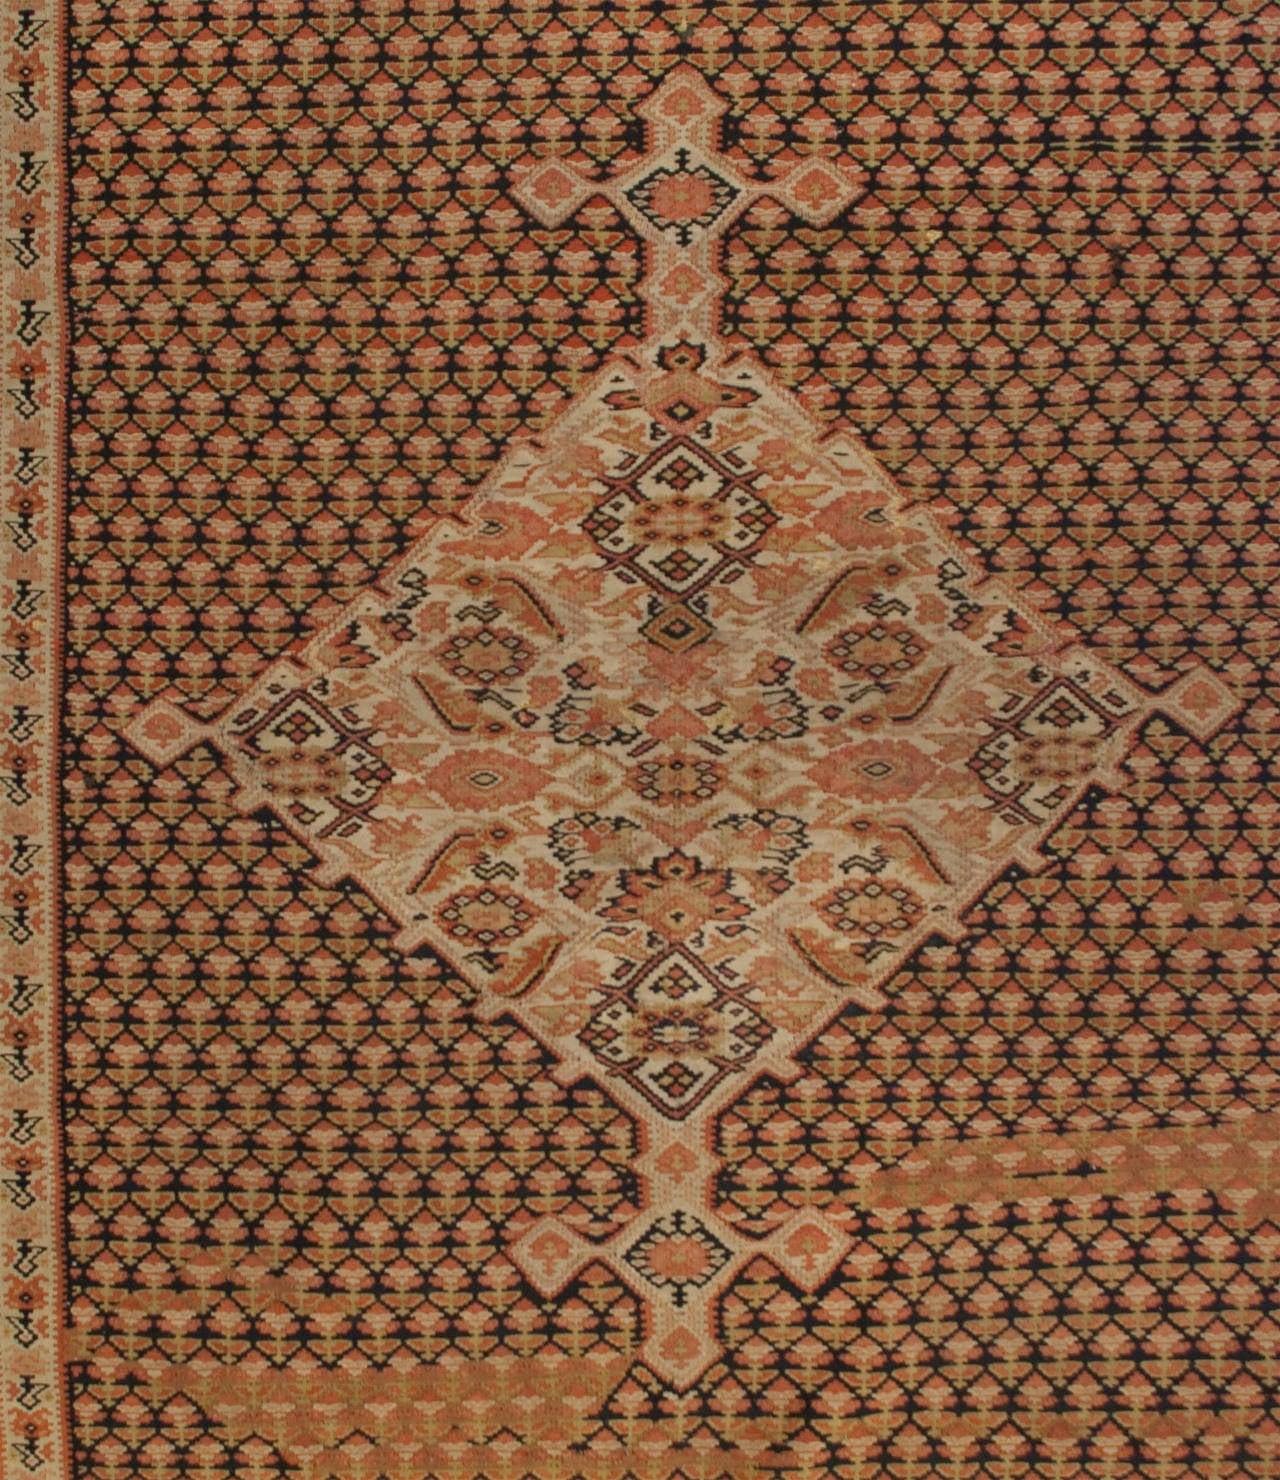 Earl 20th Century Senneh Kilim Rug For Sale At 1stdibs